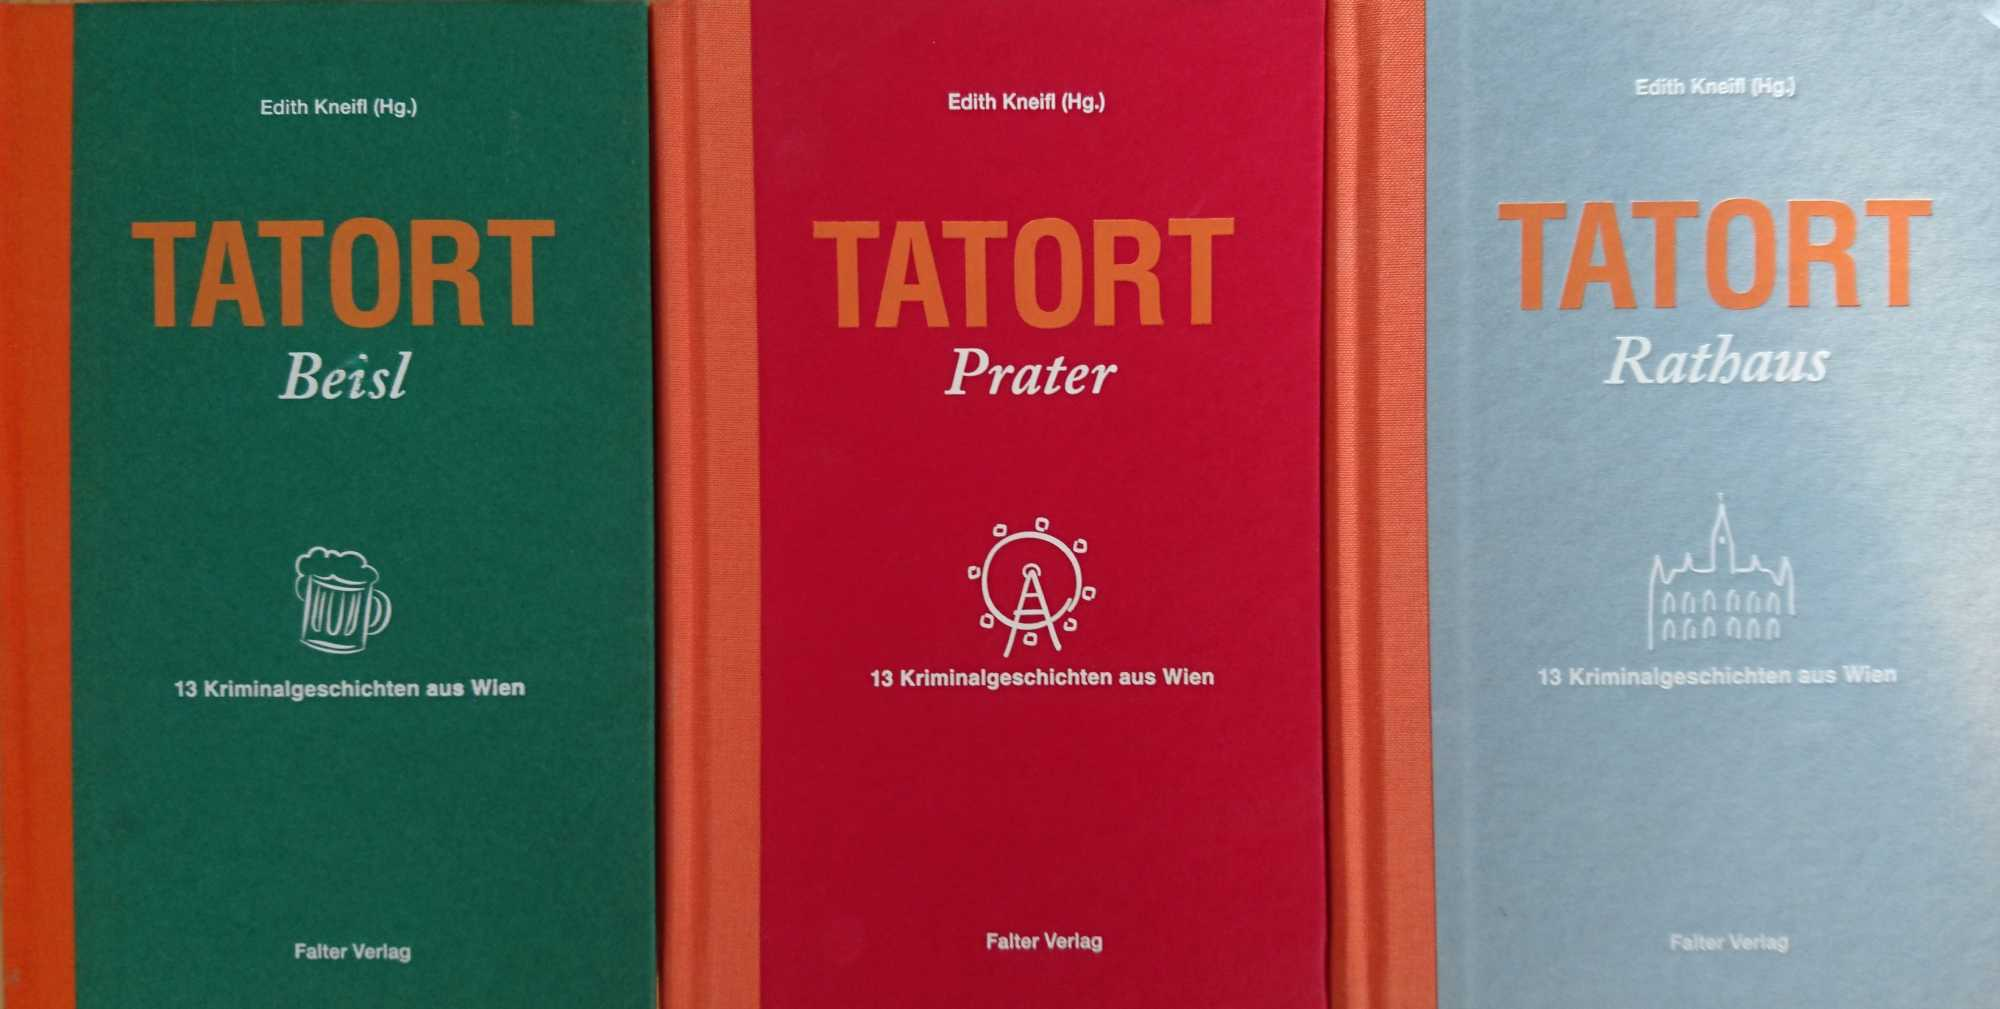 Tatort Falter Verlag © Ivo Schneider